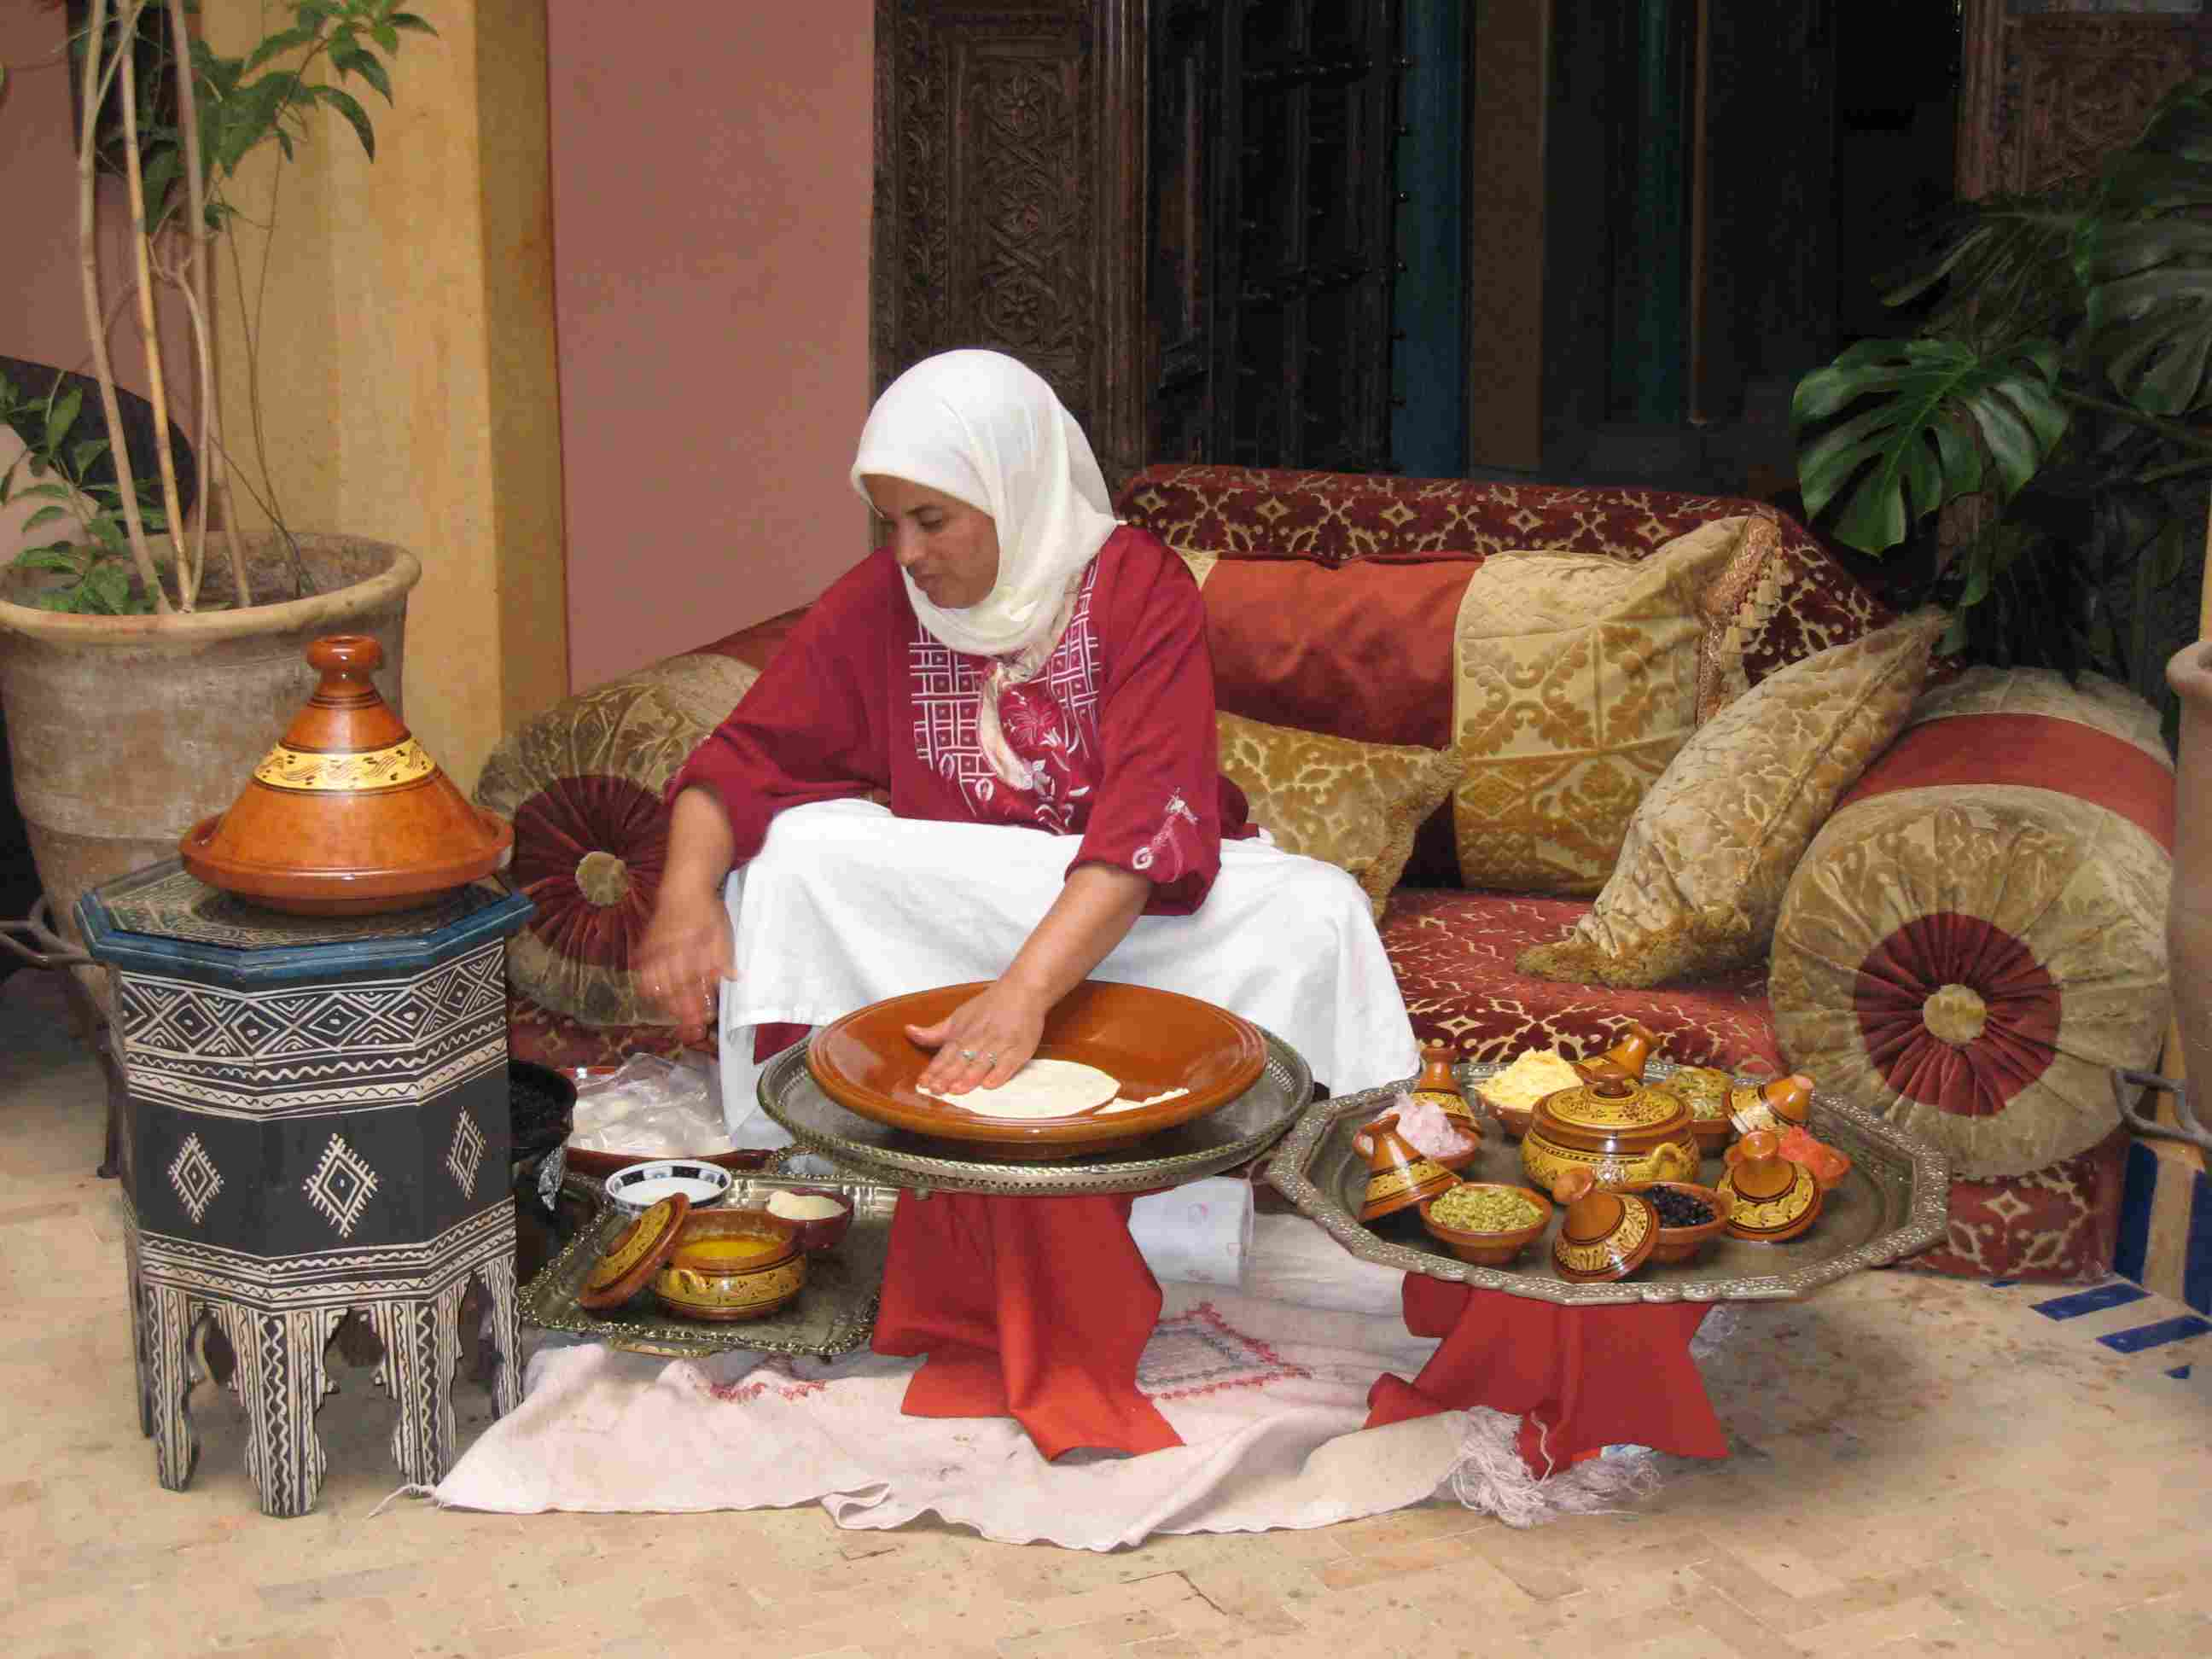 Breakfast Served at La Maison Arabe, Medina, Marrakech